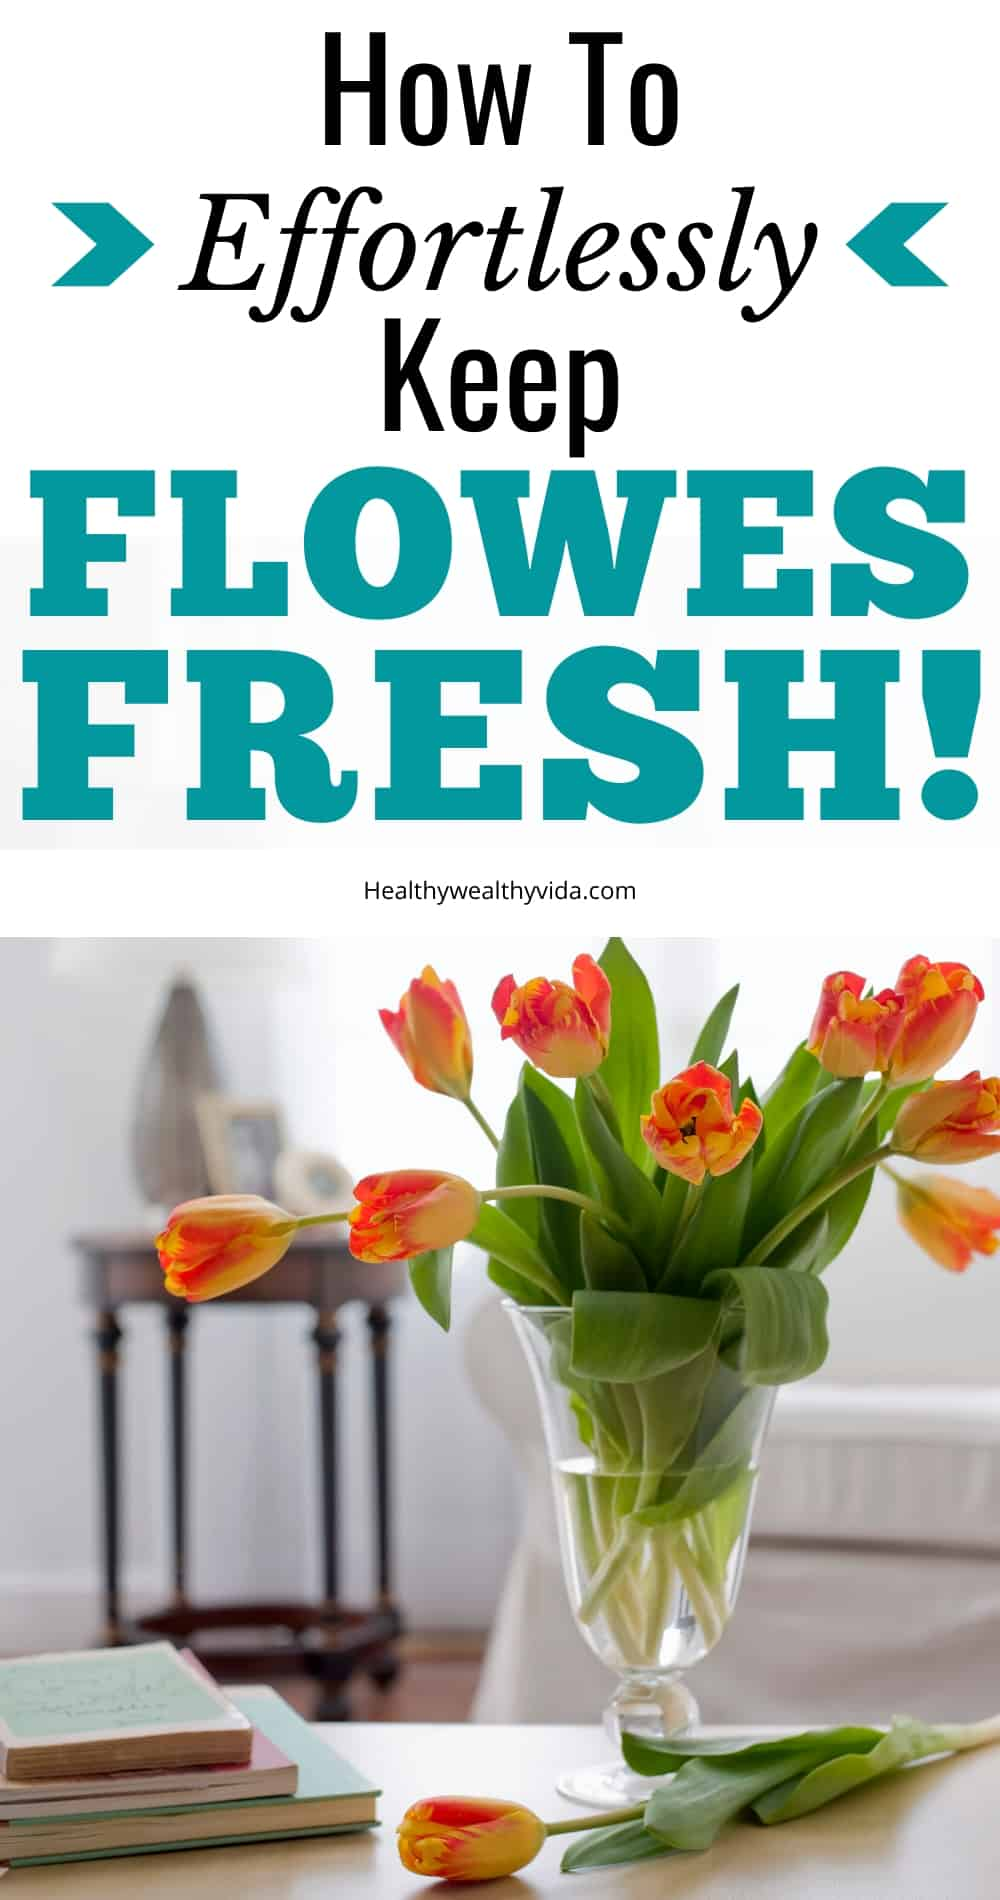 How To Easily Keep Flowers Fresh